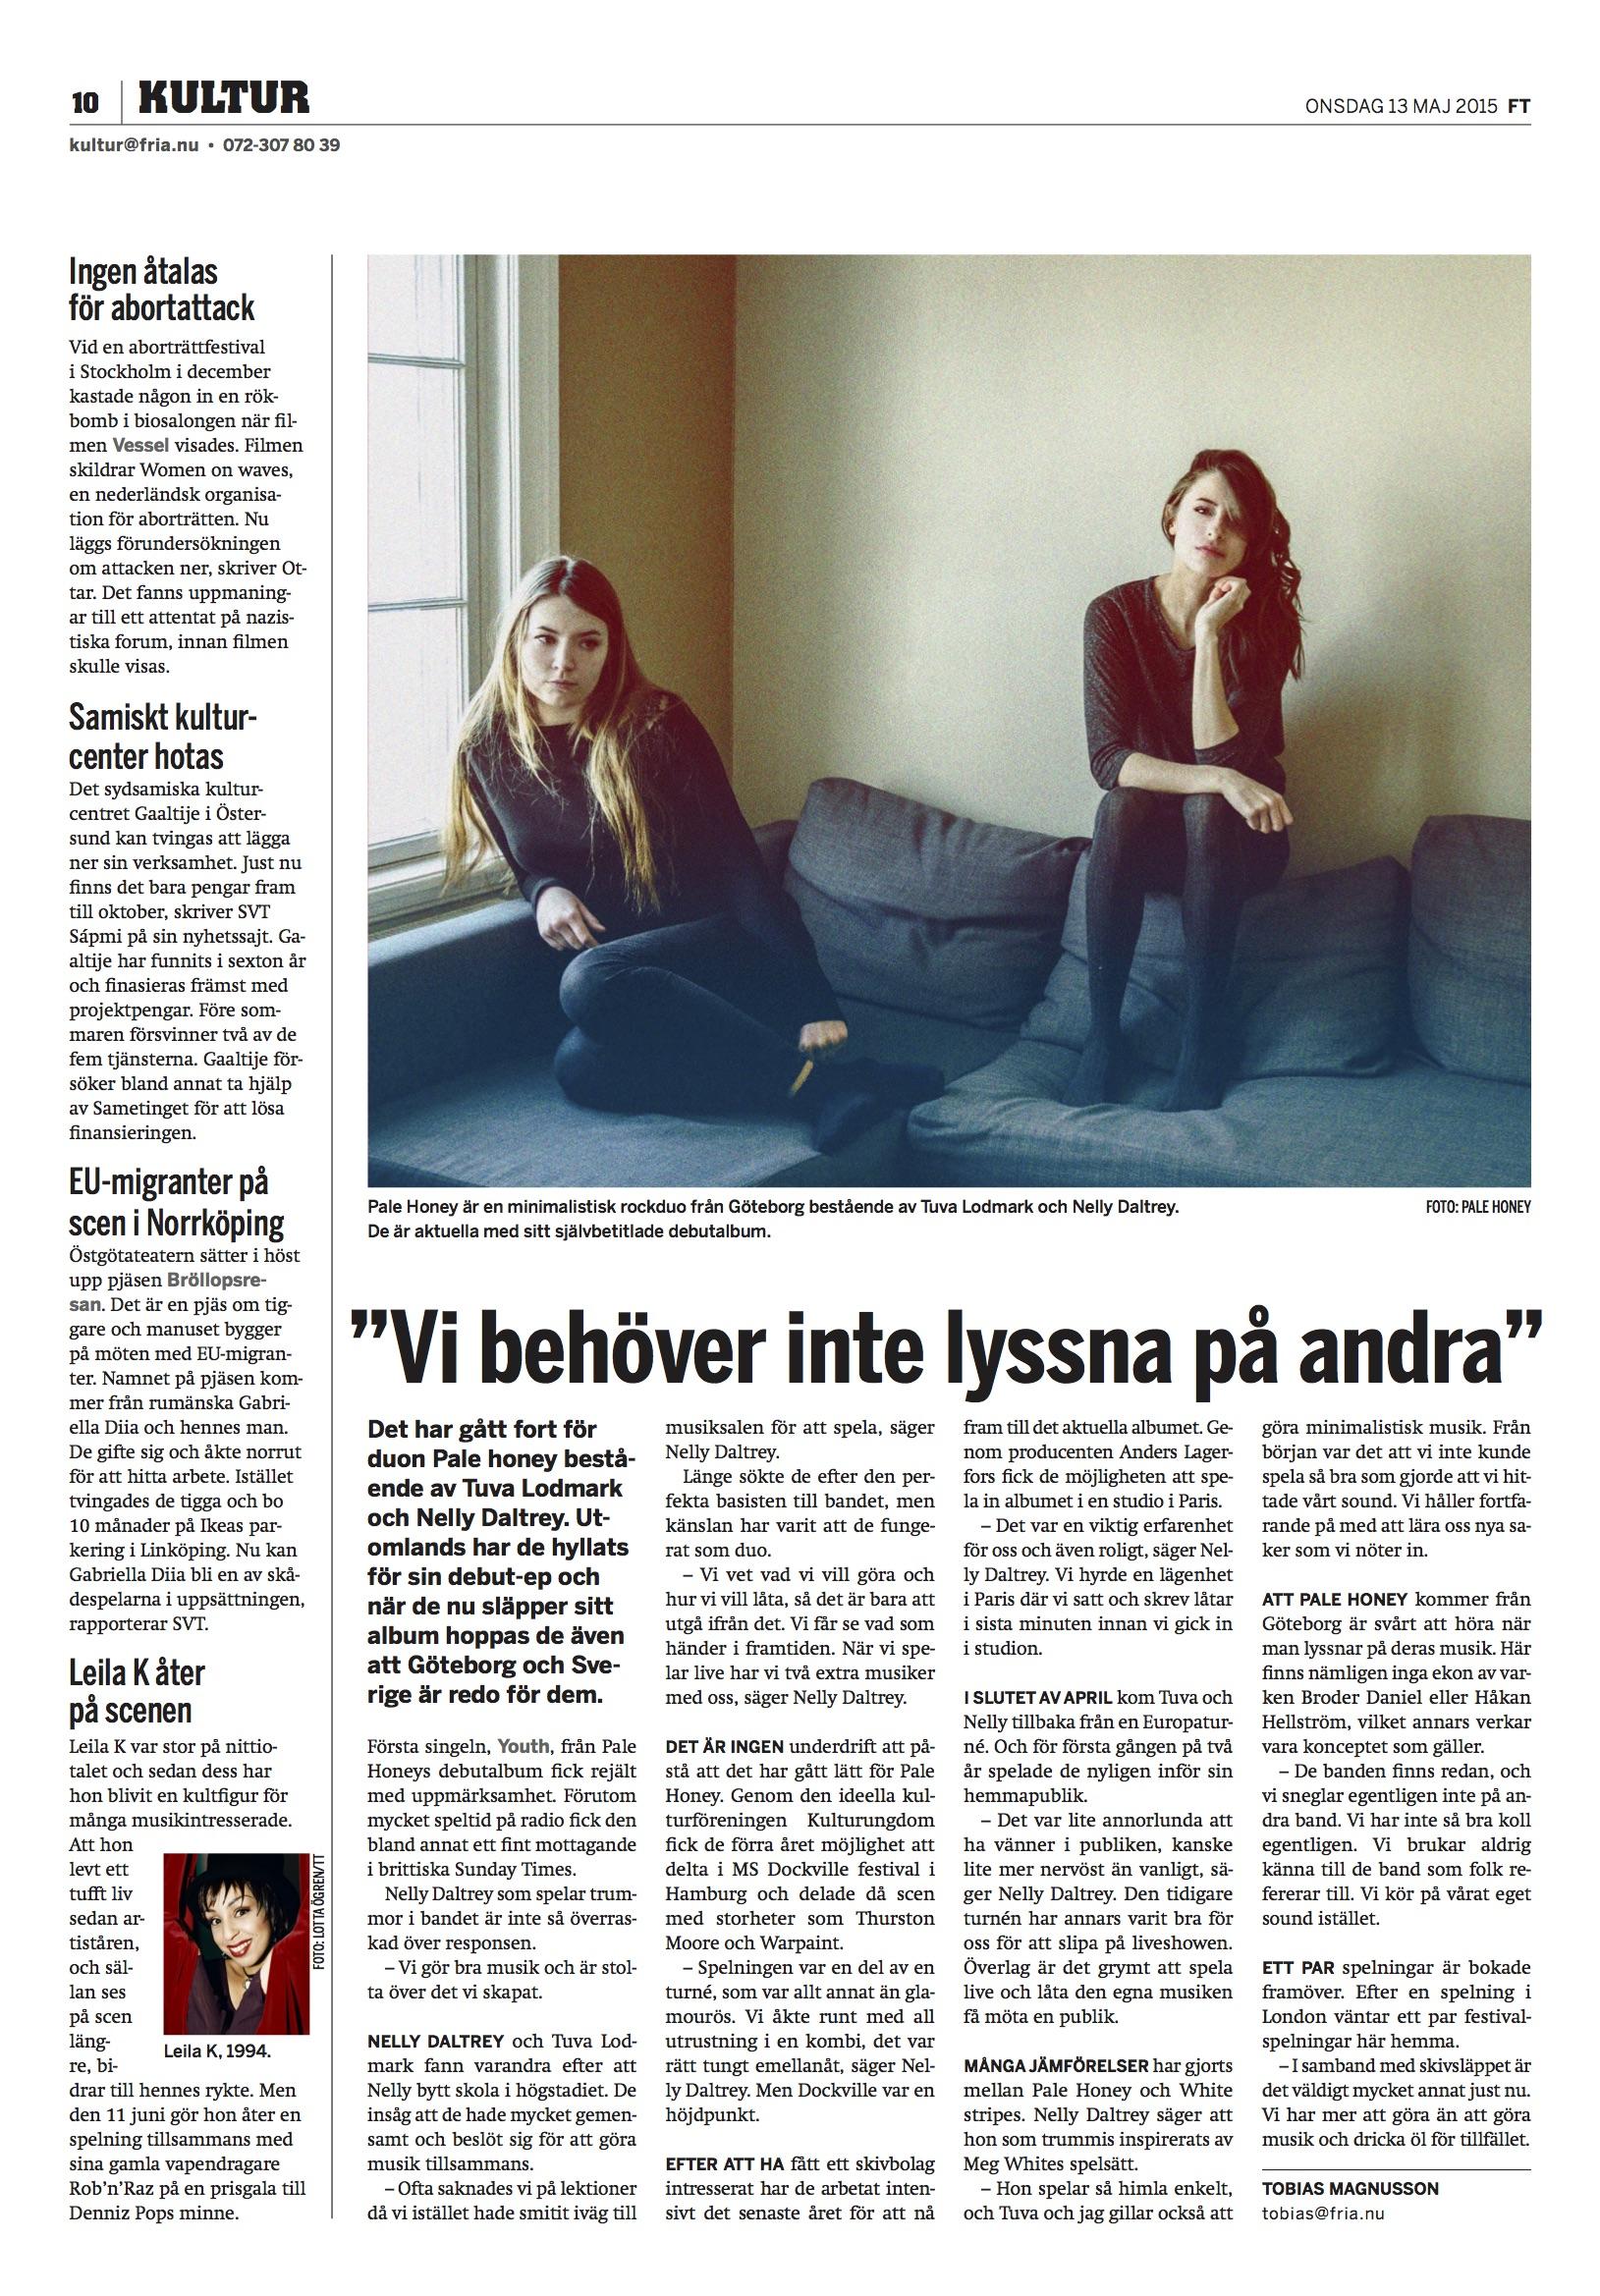 Fria GBG intervju - Pale Honey.jpg